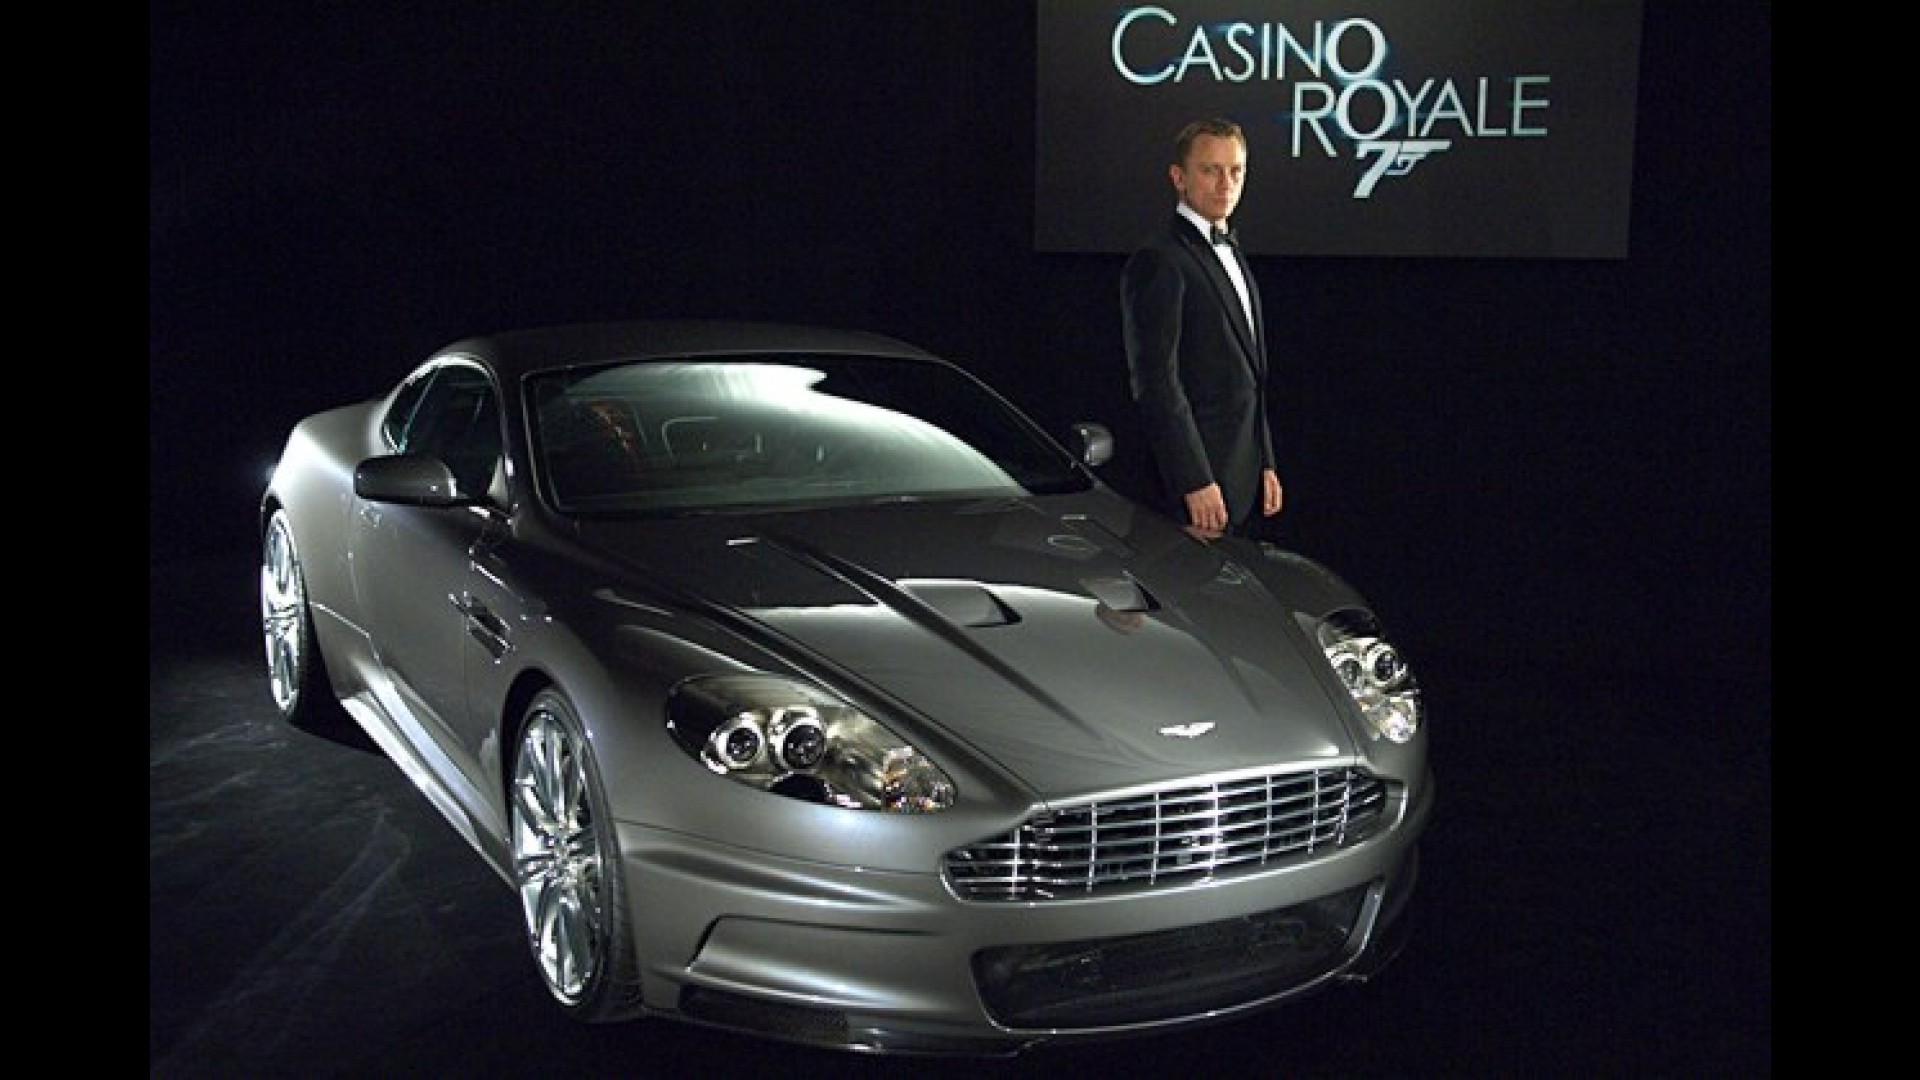 Aston Martin Dbs James Bonds Auto In Casino Royale